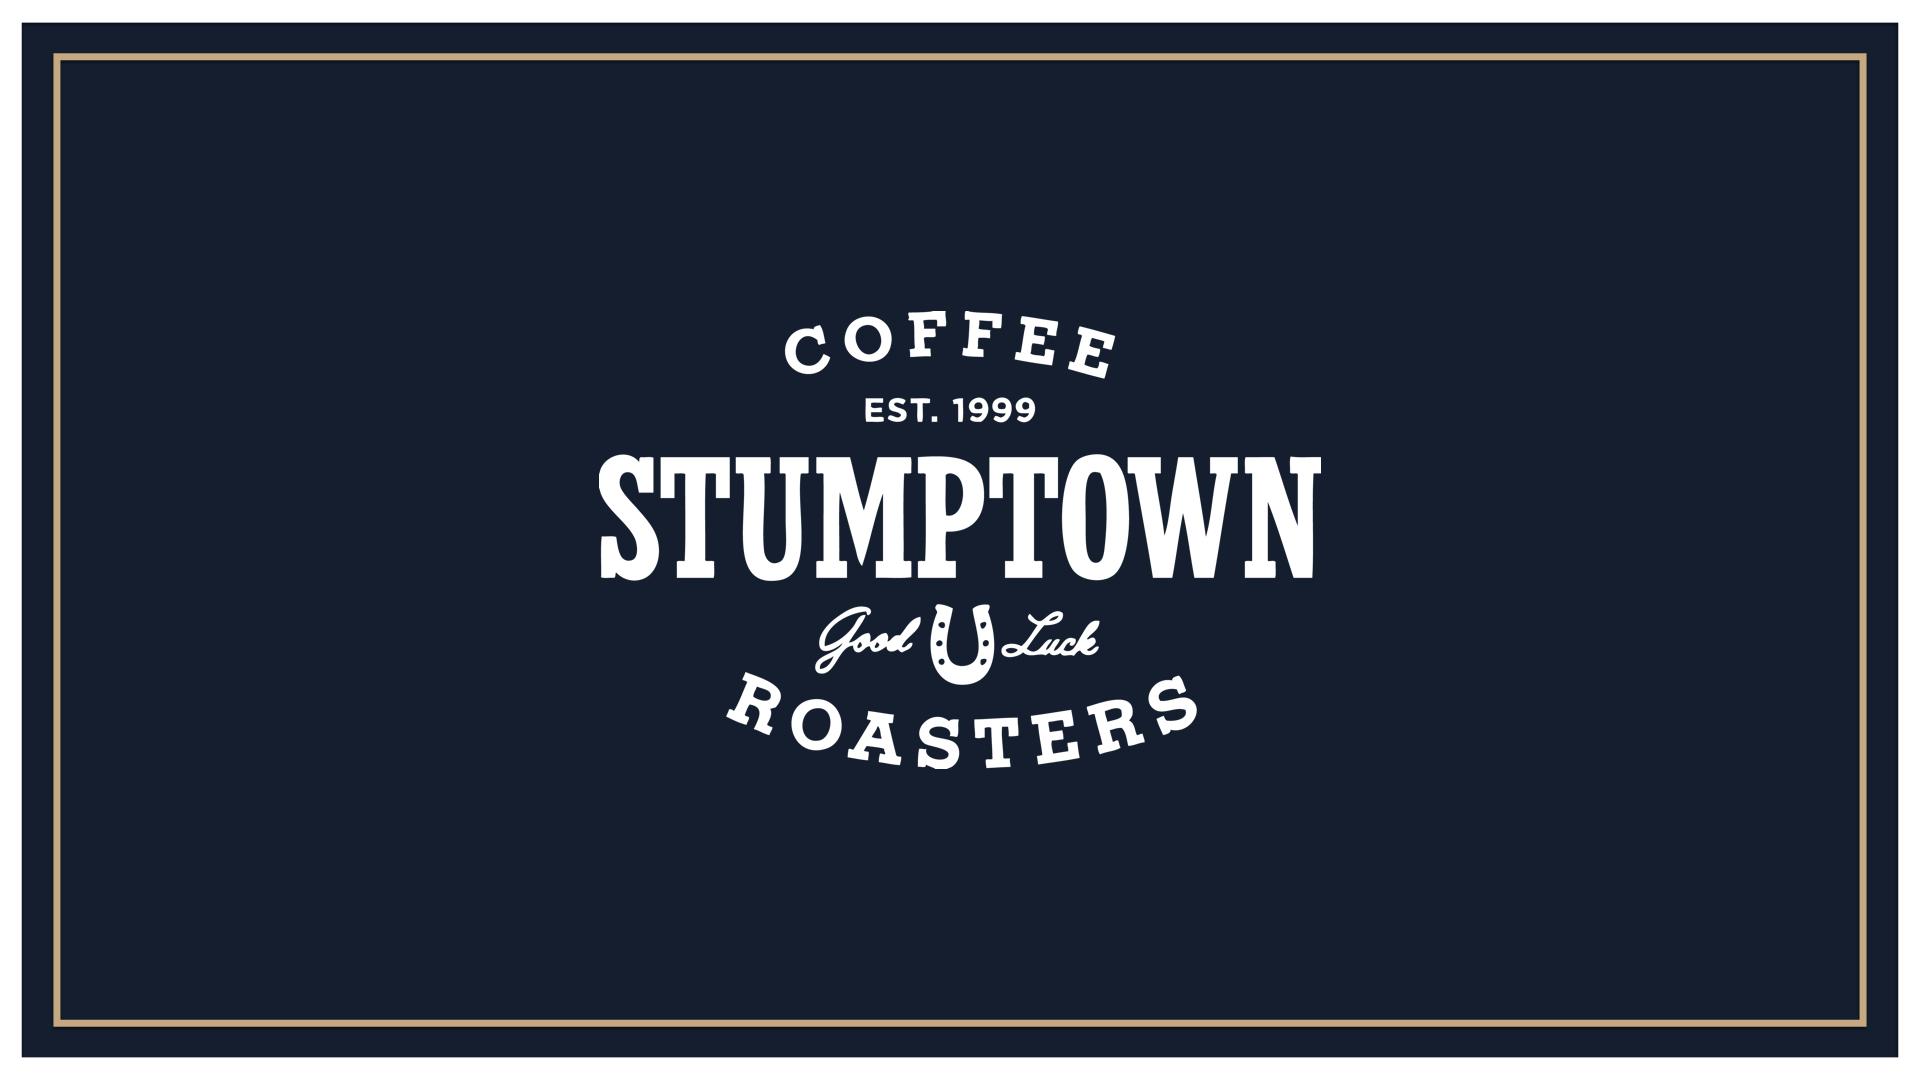 stumptown.001.jpeg